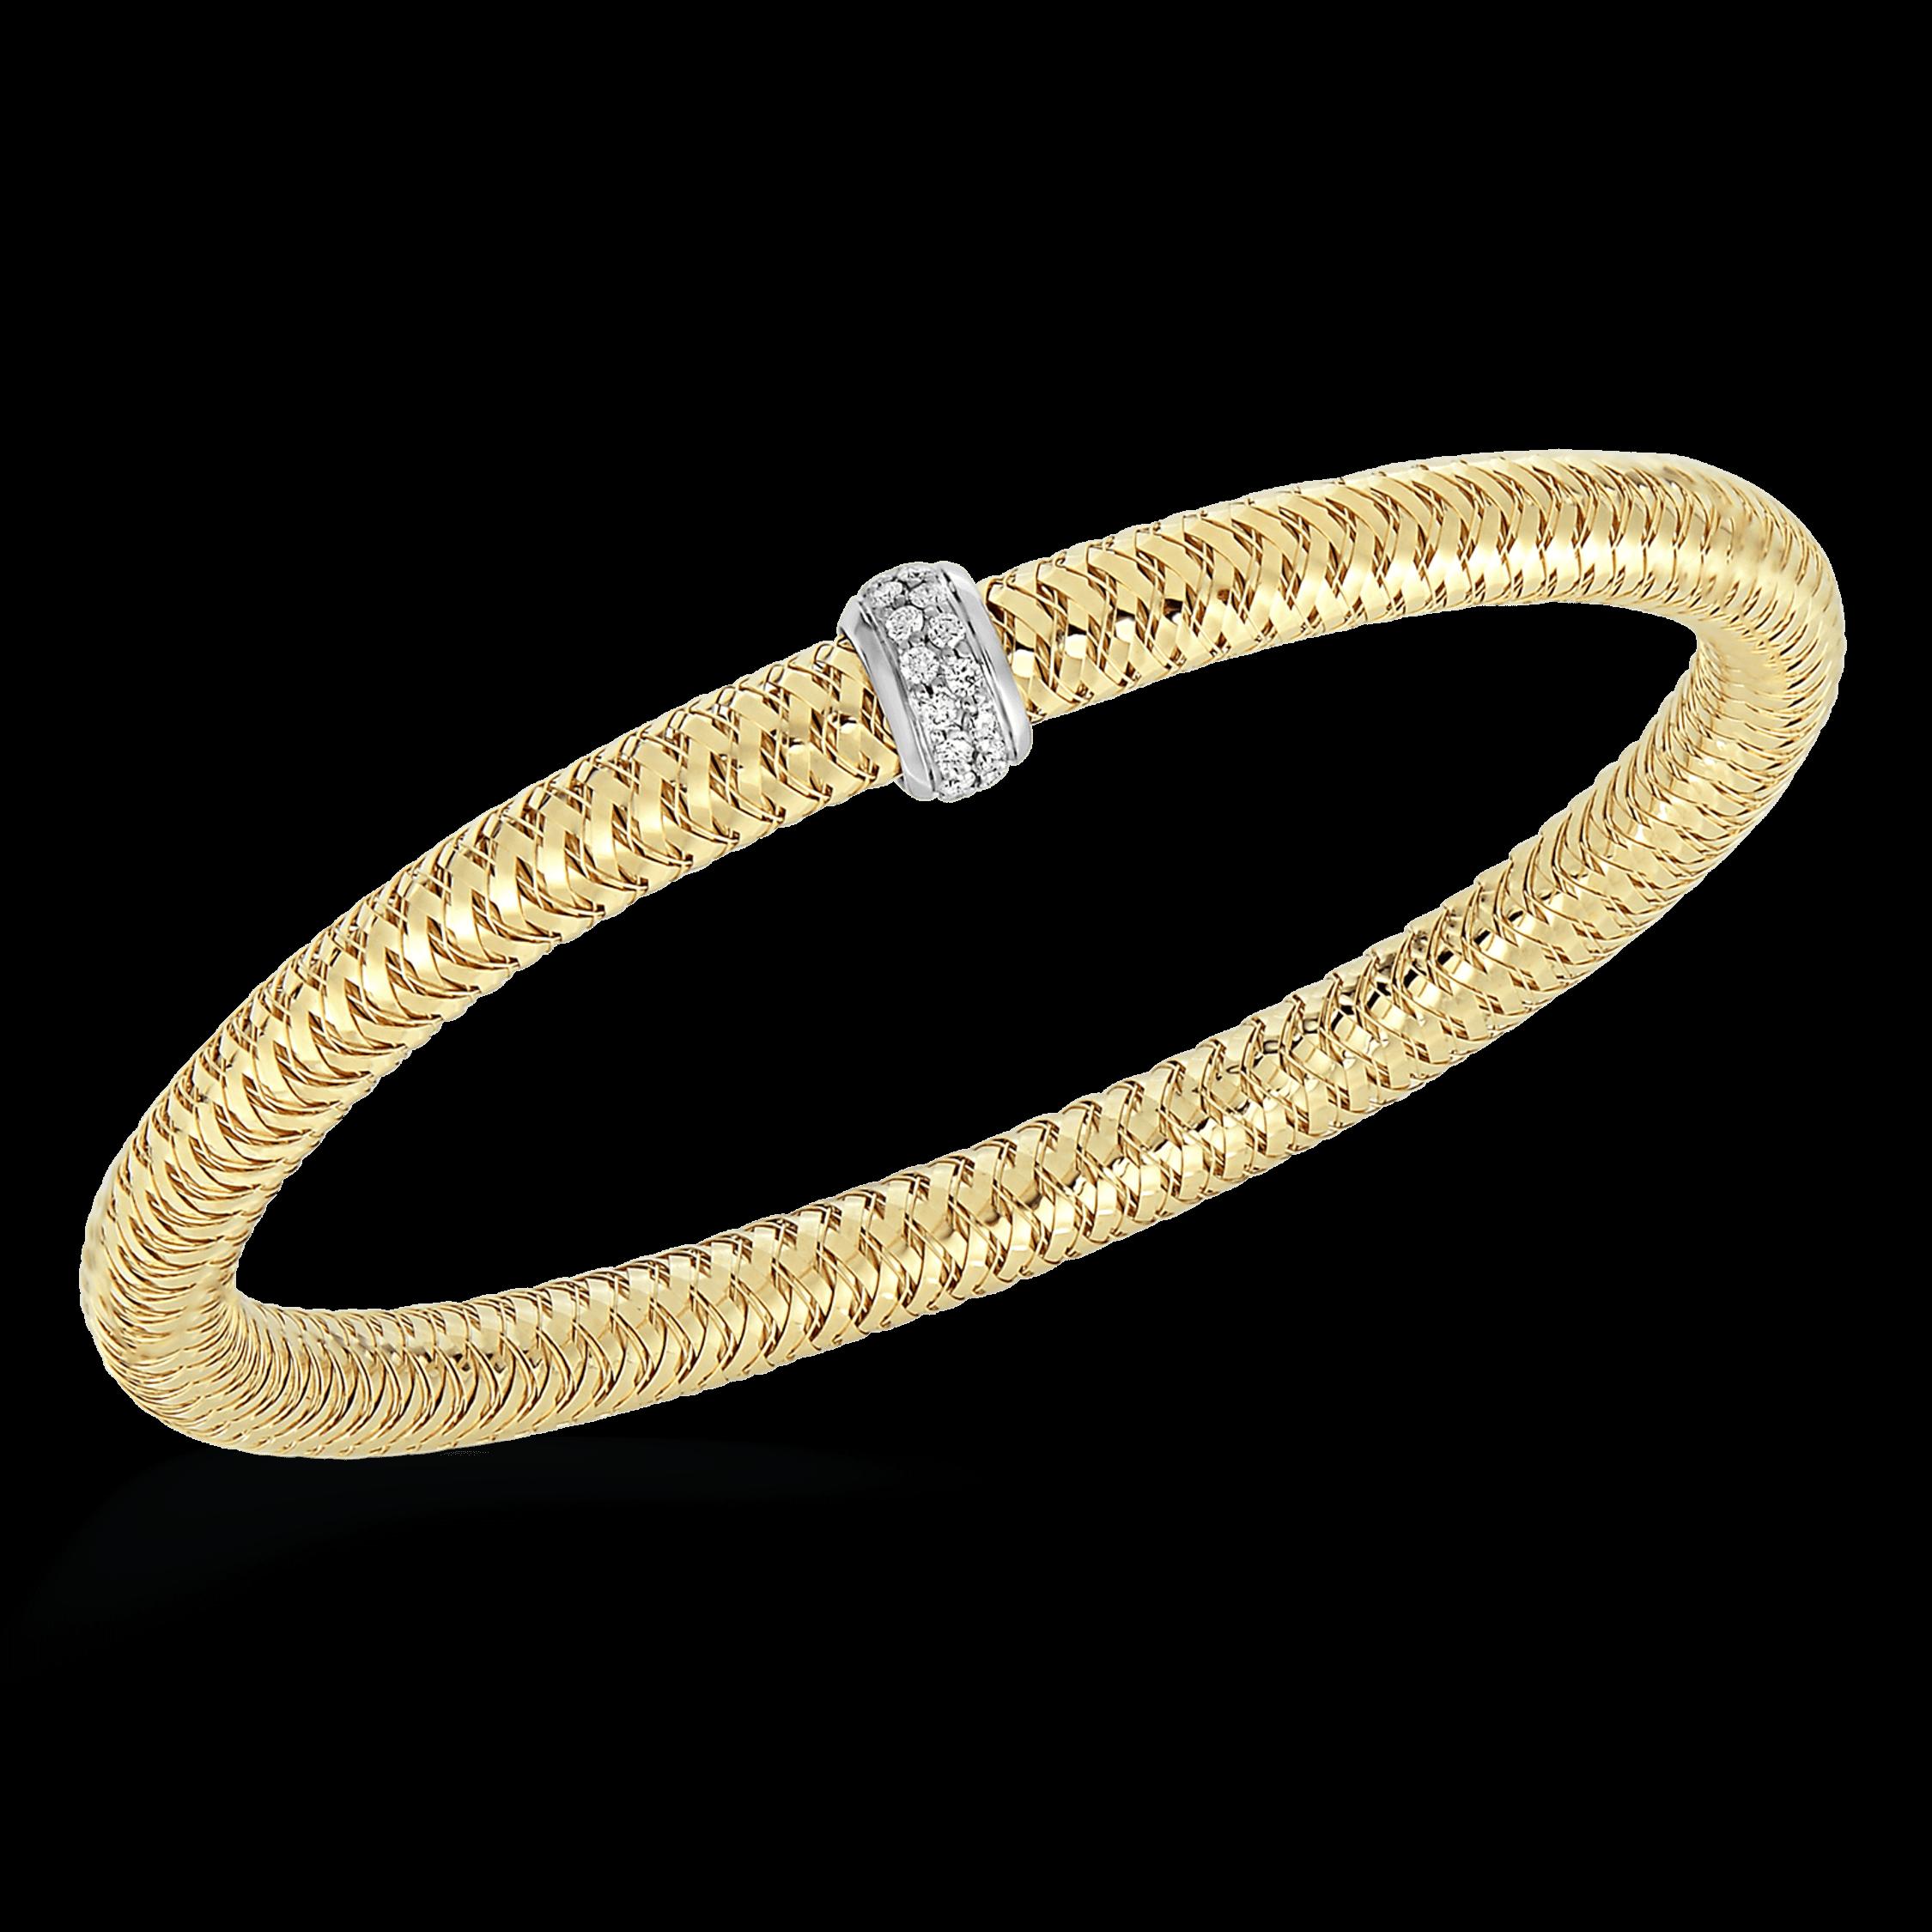 Roberto Coin Primavera Diamond Woven Bangle Bracelet 0